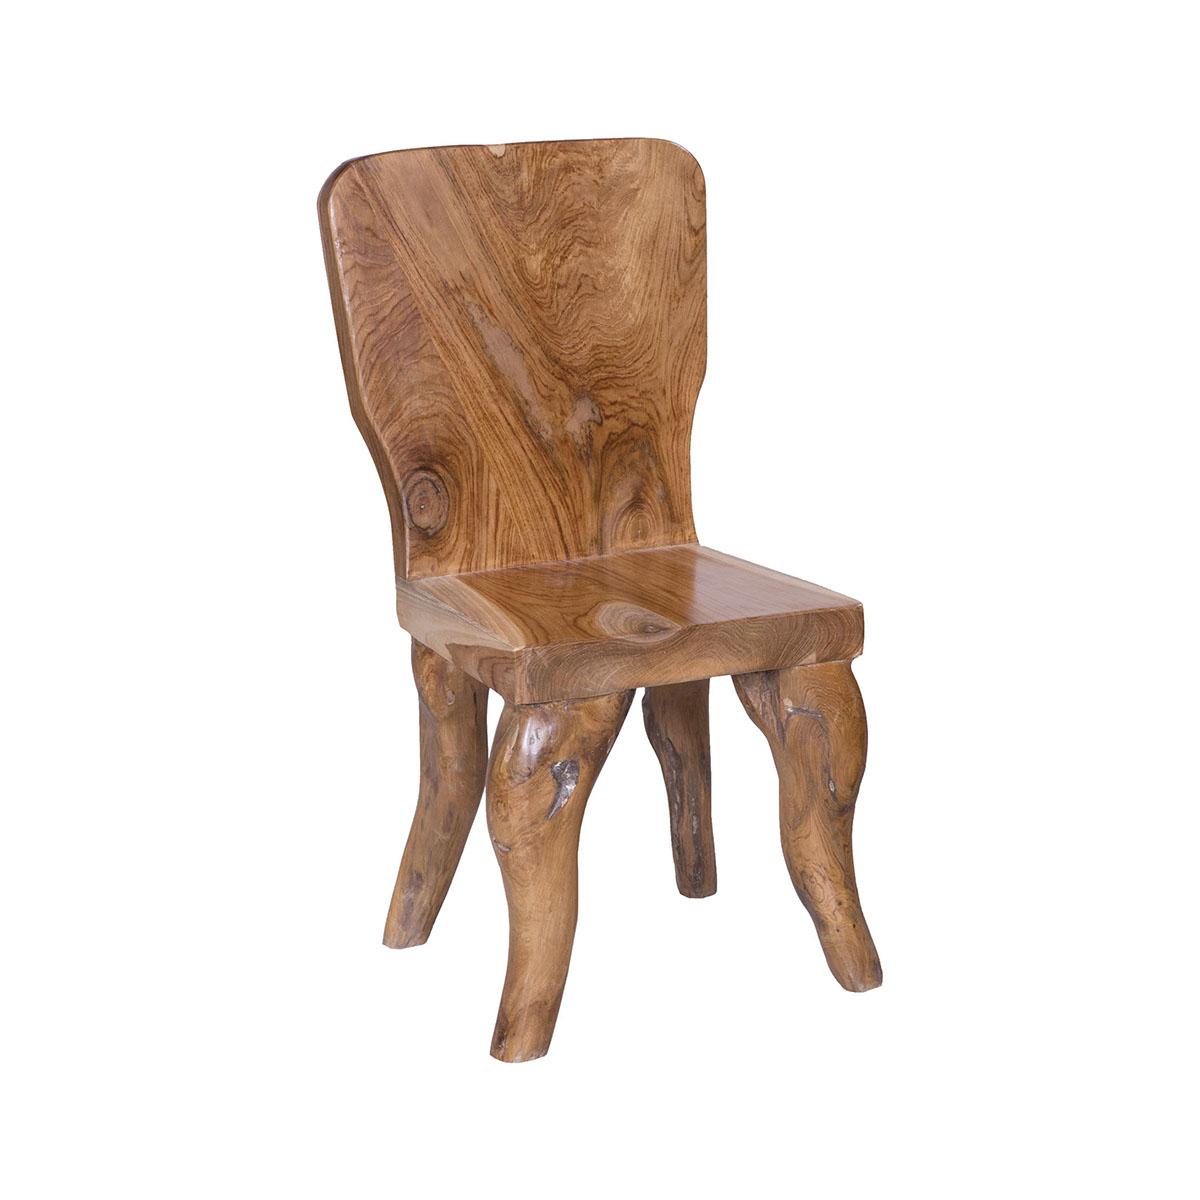 Rustic Teak Outdoor Dining Chair 6917529 | ELK Home